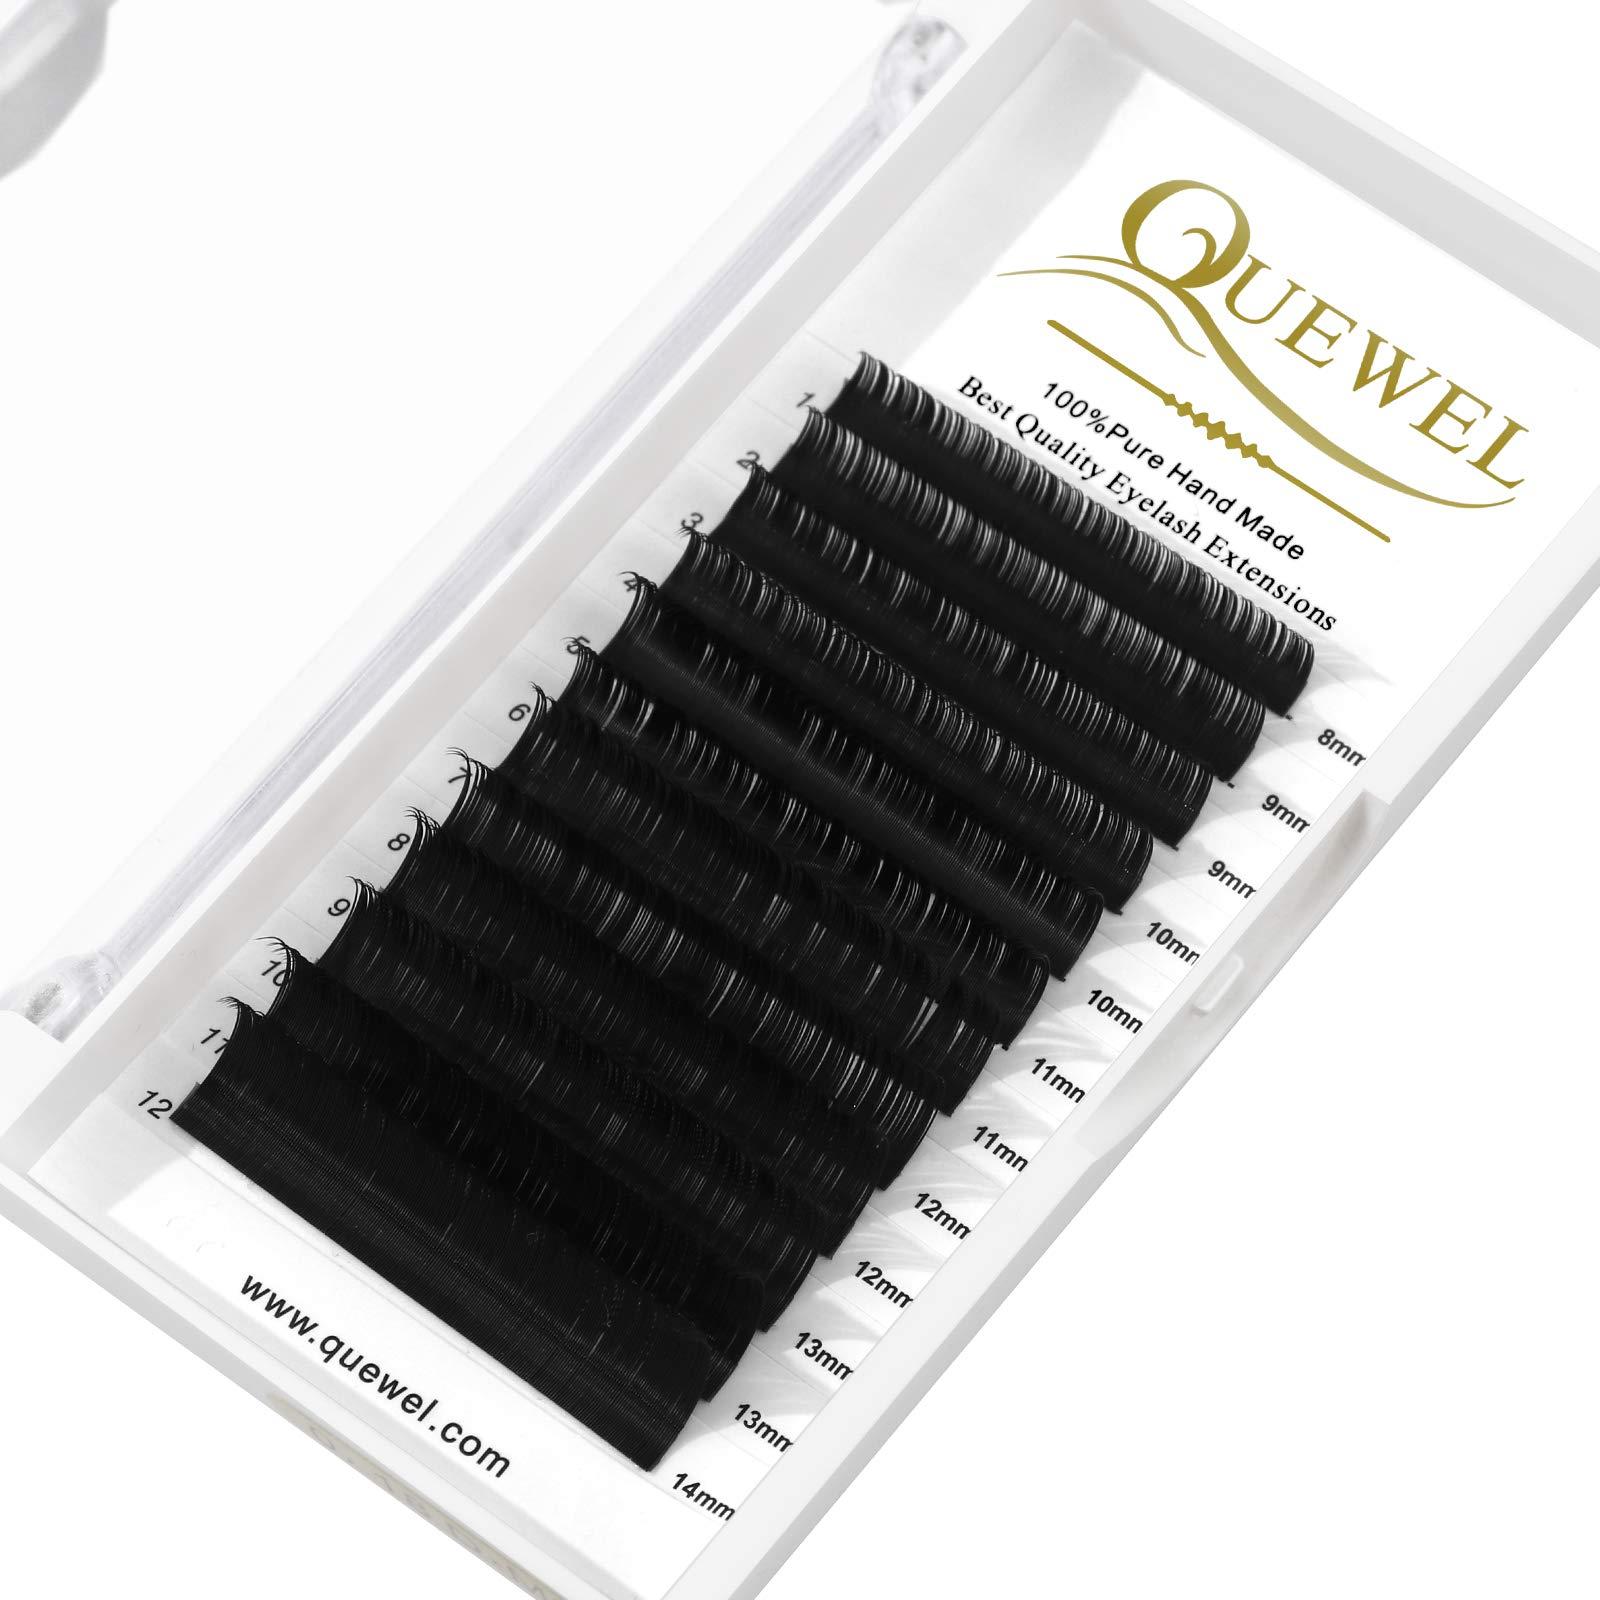 Eyelash Extension Supplies 0.15 D Curl Mix-8-14mm Classic Individual Lash Extensions Optinal 0.03/0.05/0.07/0.10/0.15/0.20 C/D Single 8-25mm Mix 8-14mm 15-20mm 20-25mm (0.15 D MIX-8-14mm)